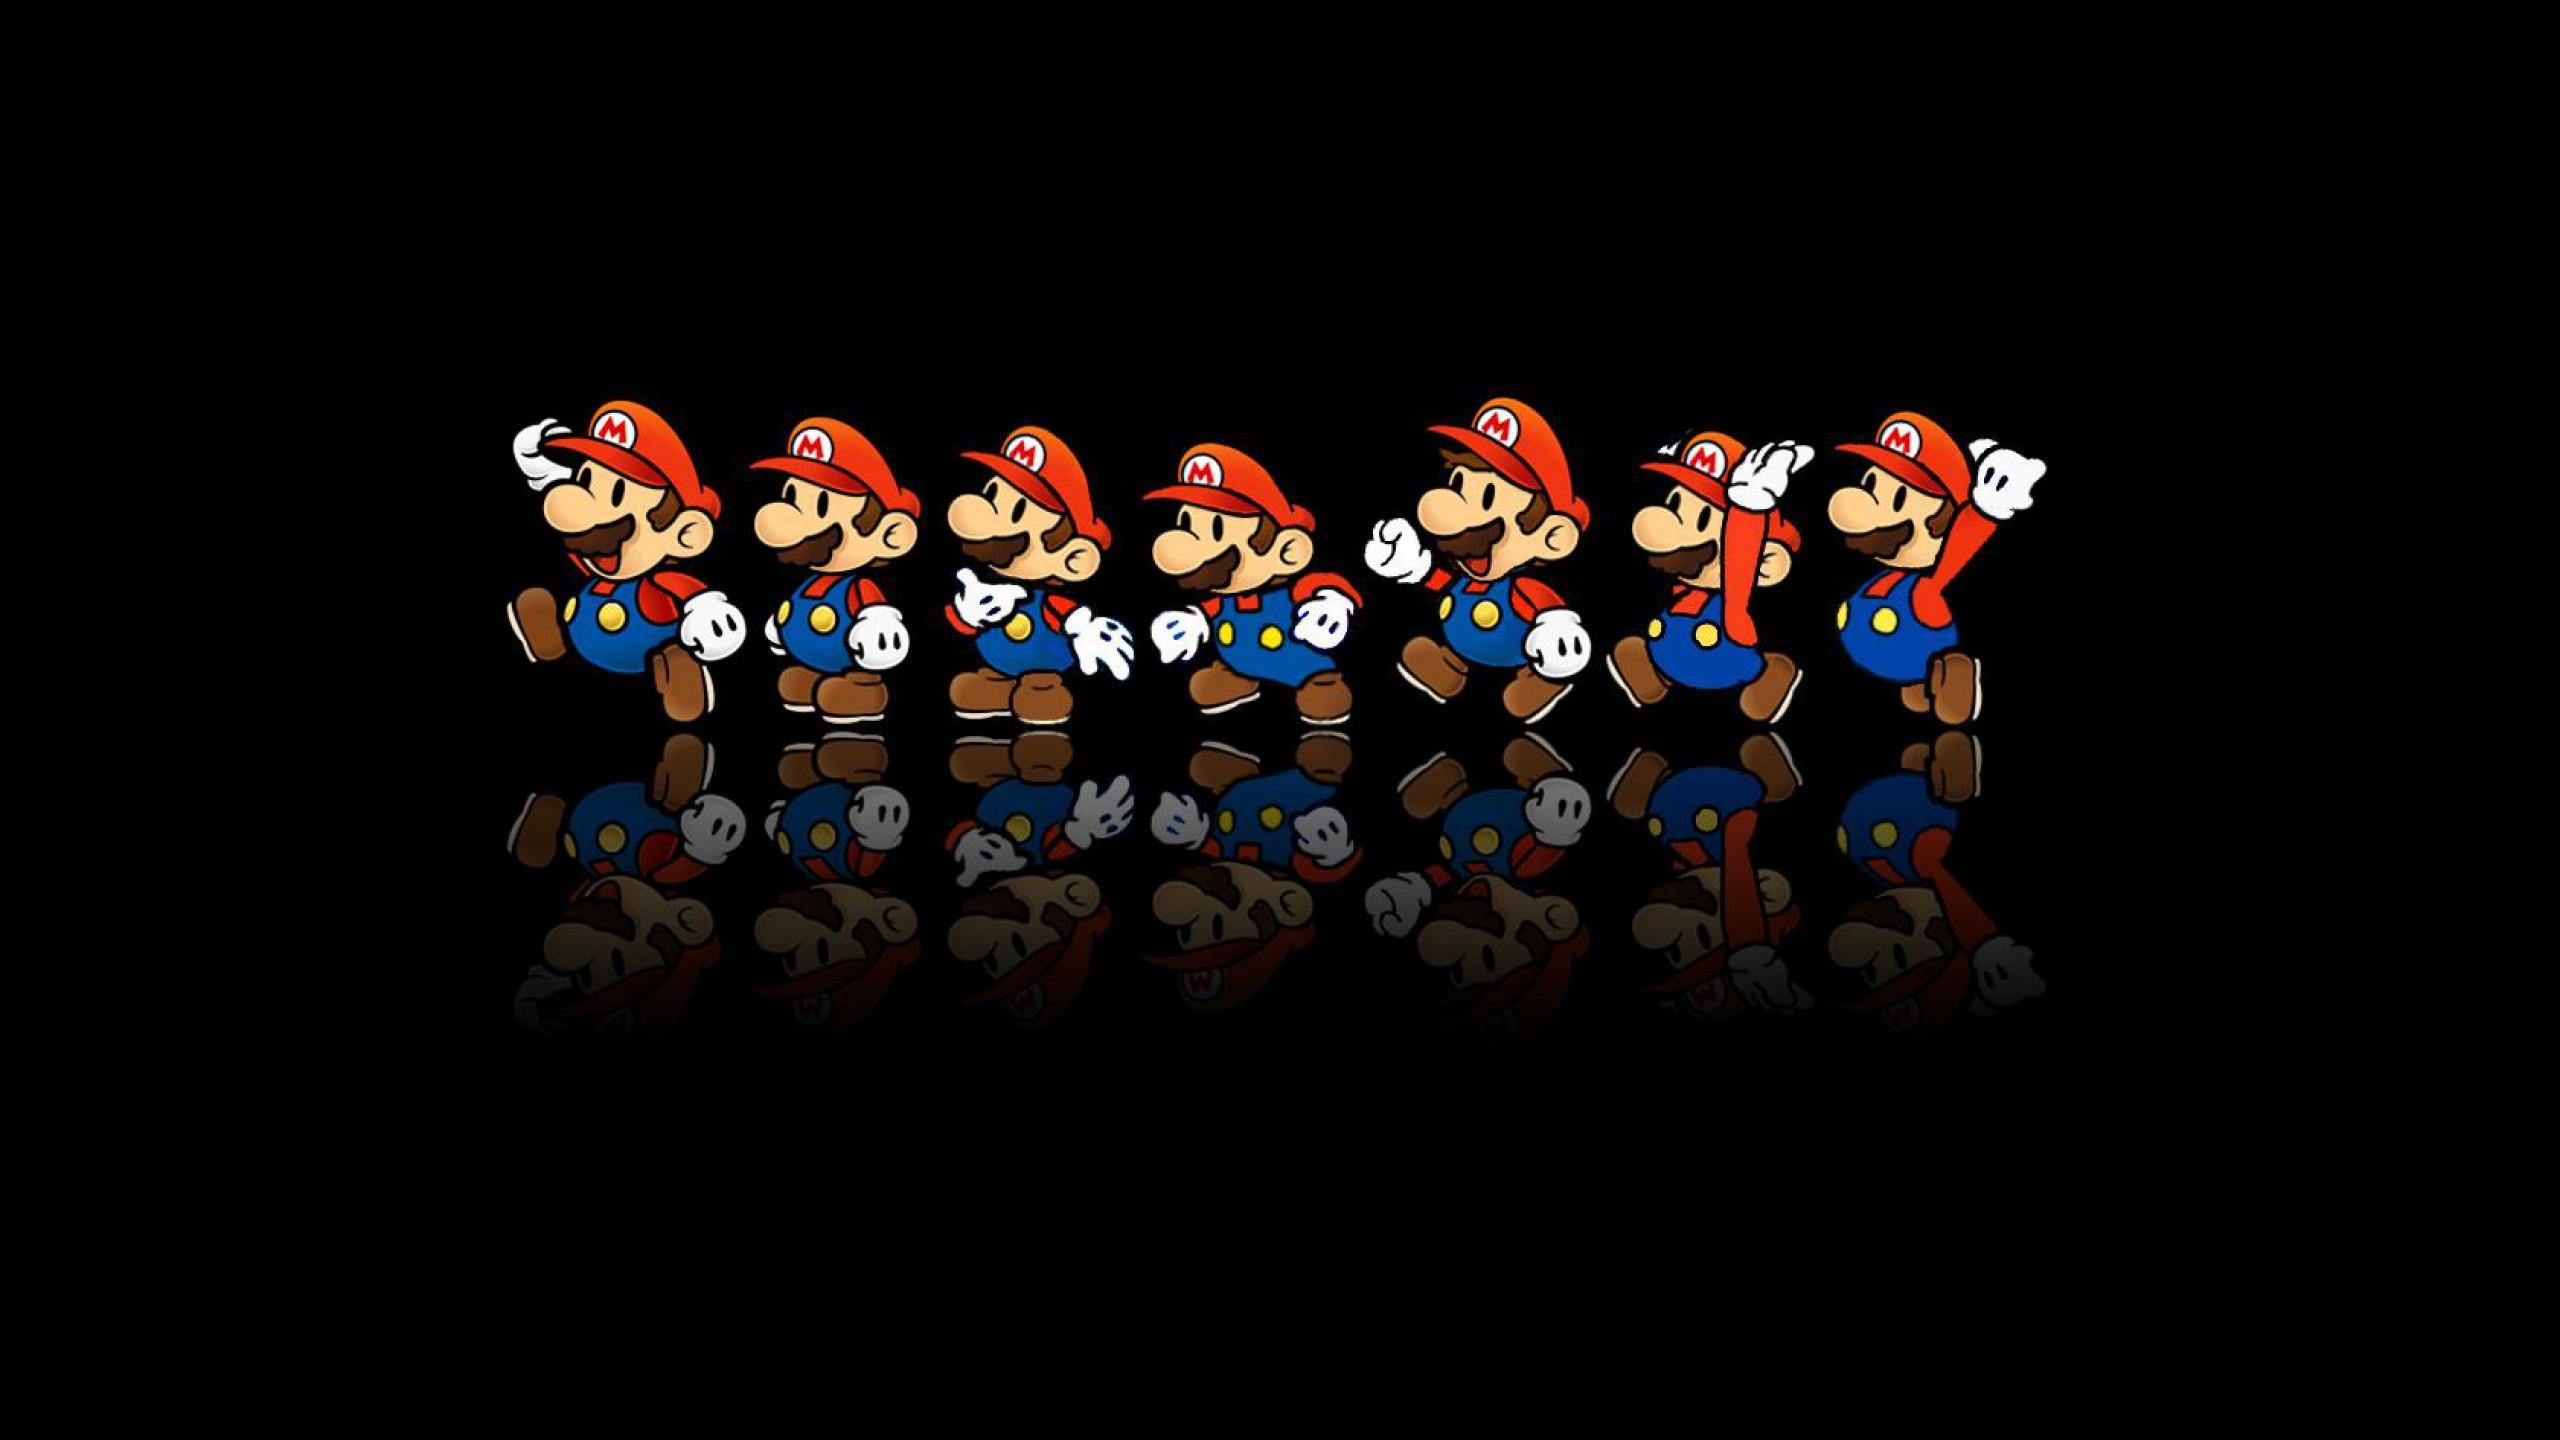 Gaming Wallpaper Image Gallery – HCPR (2560×1440) …